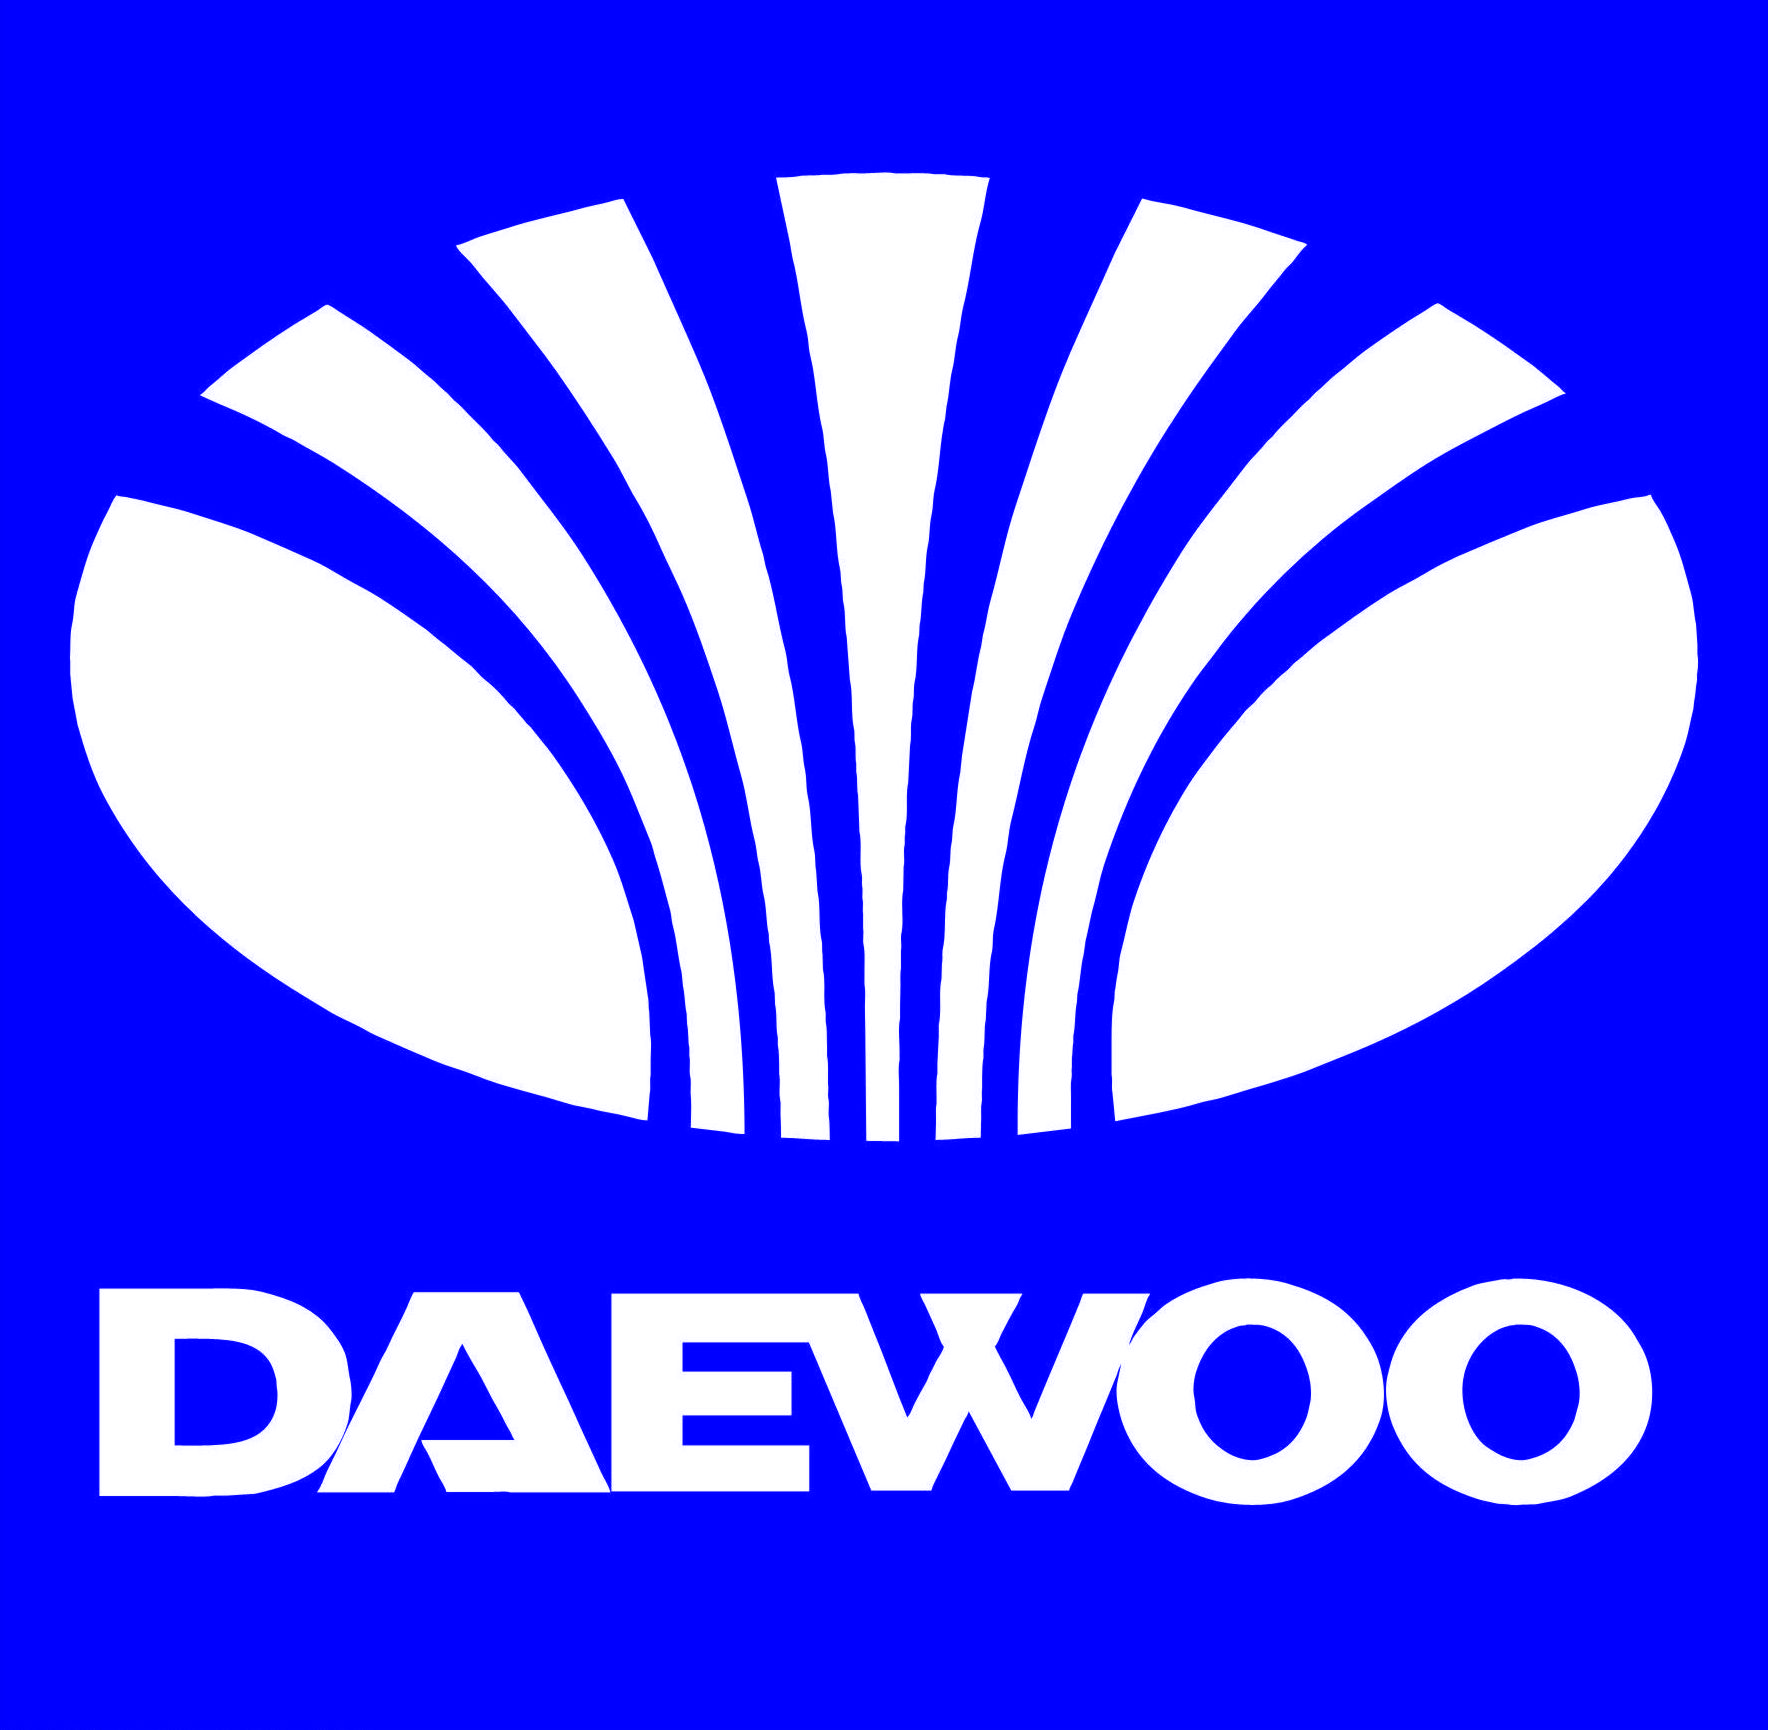 Daewoo Logo Wallpaper